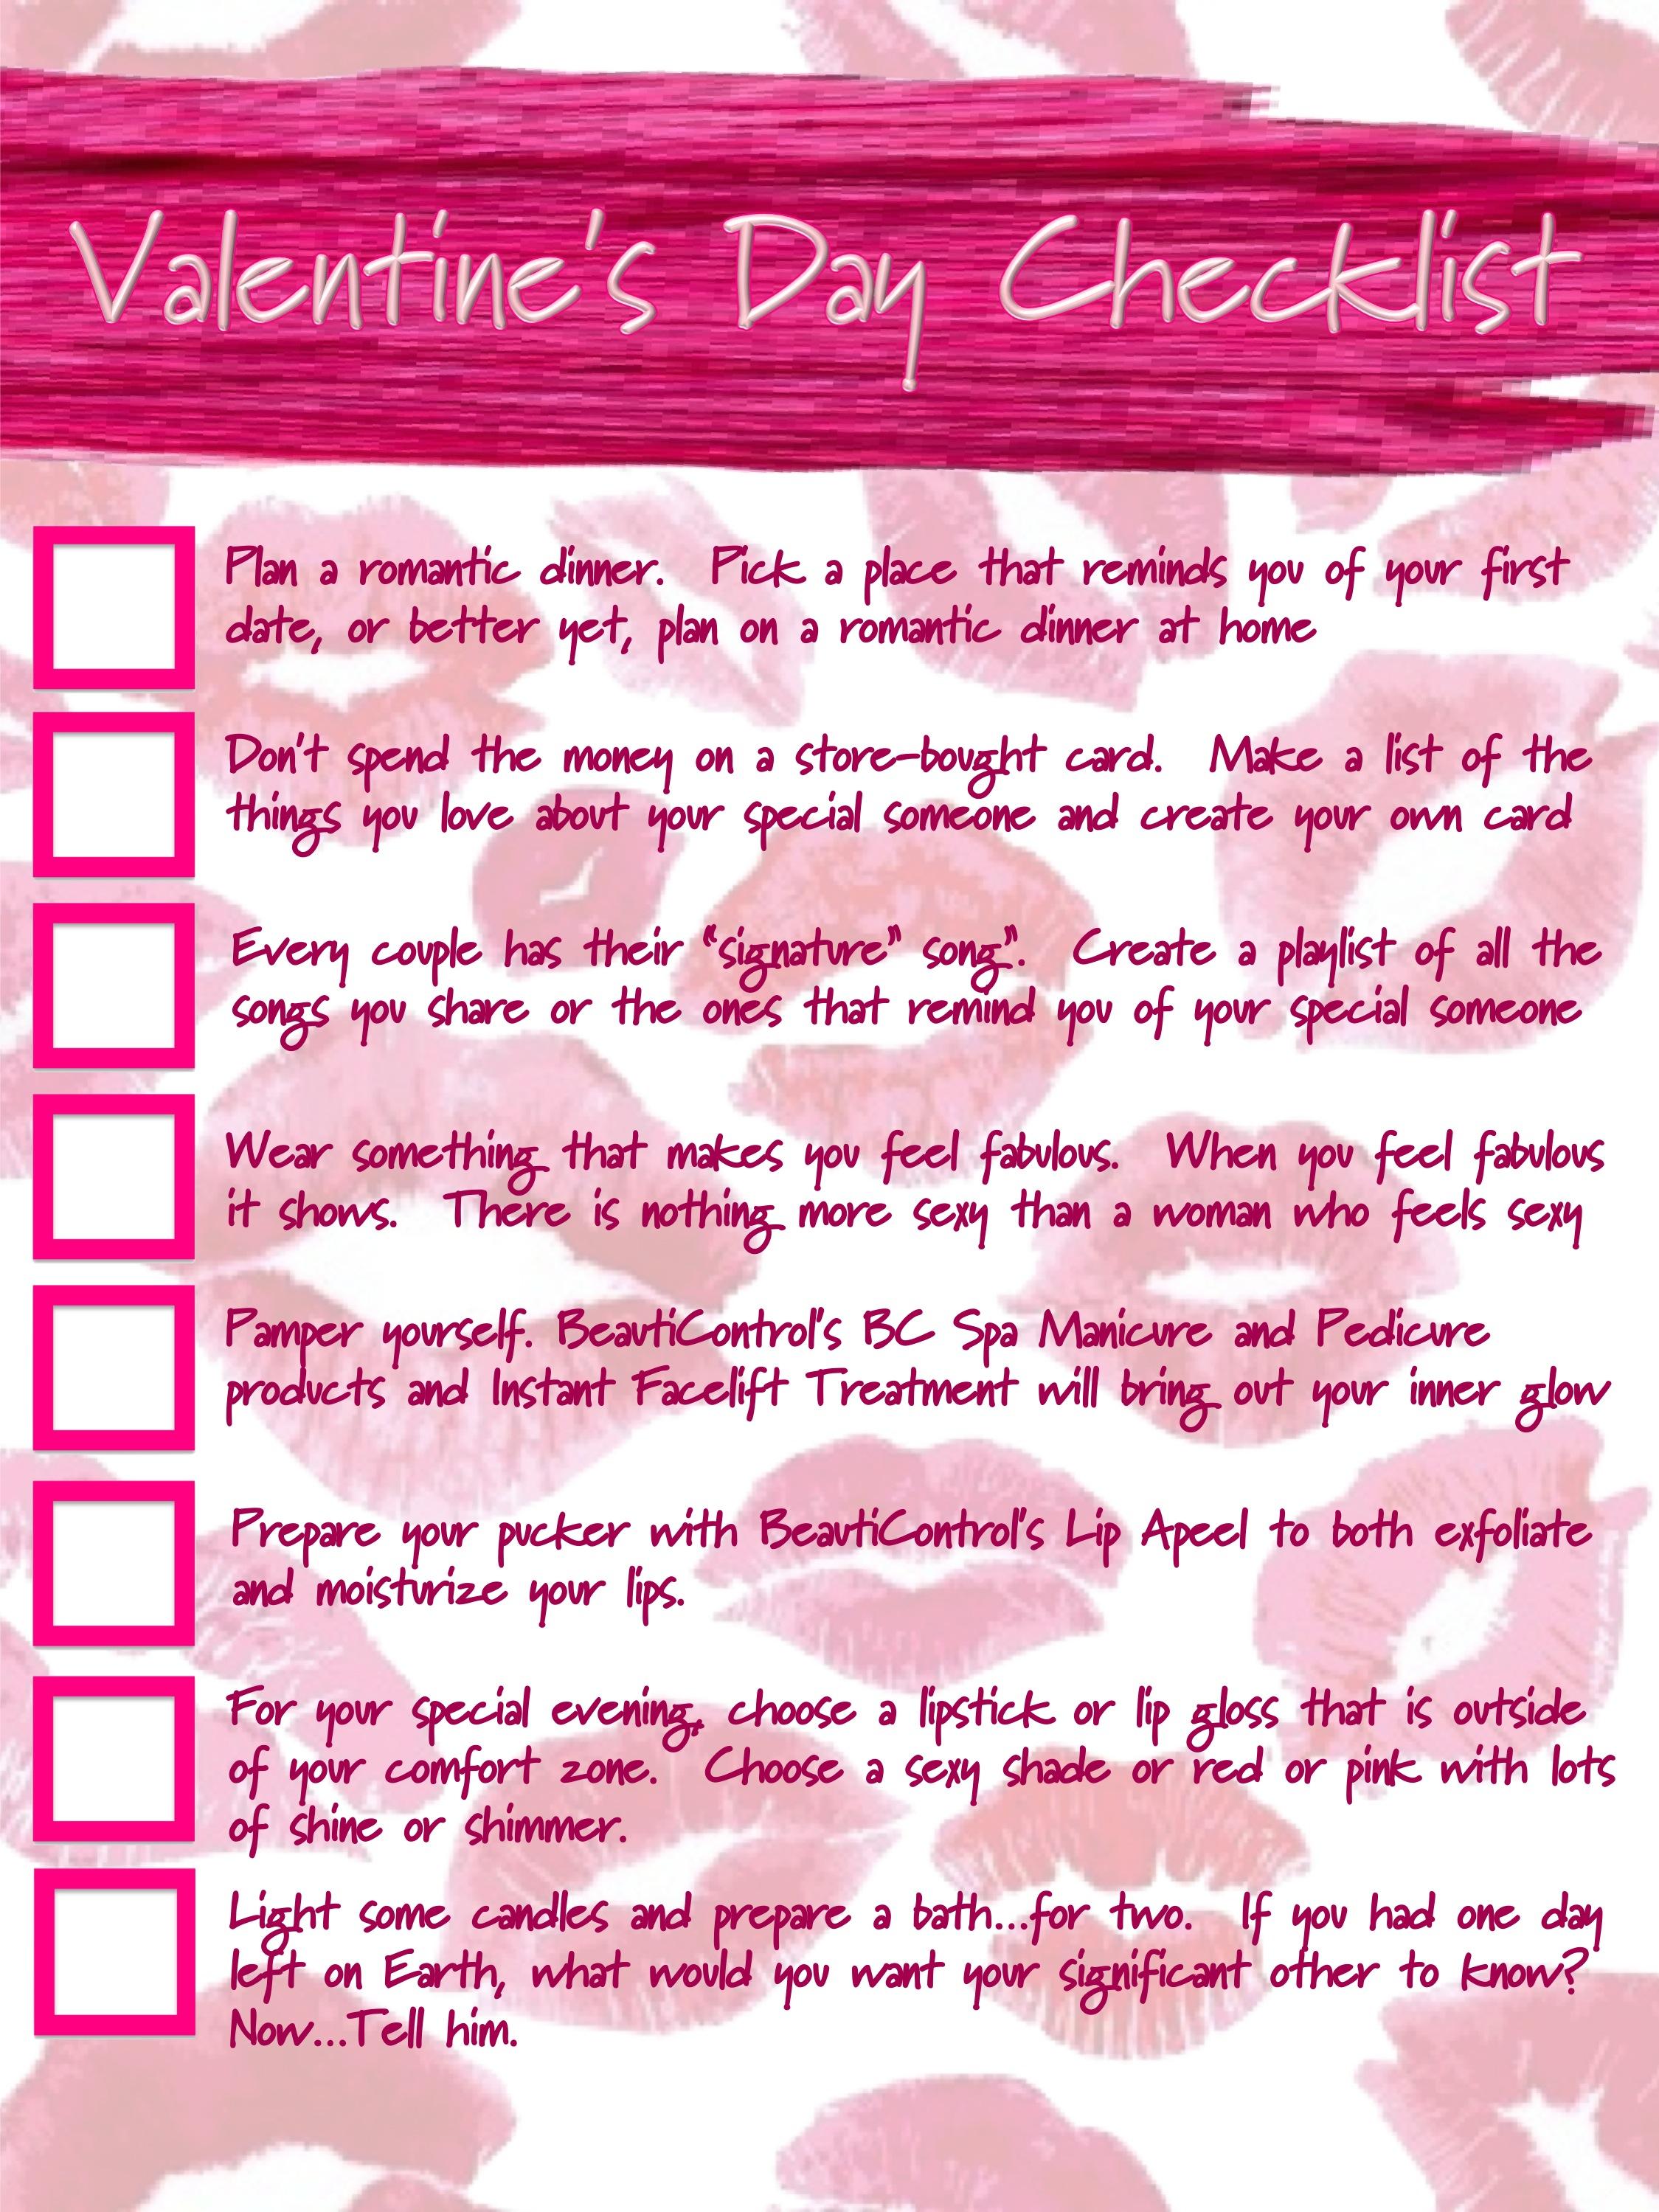 Gary\'s Blog: BeautiCoach: Valentine\'s Day Check List